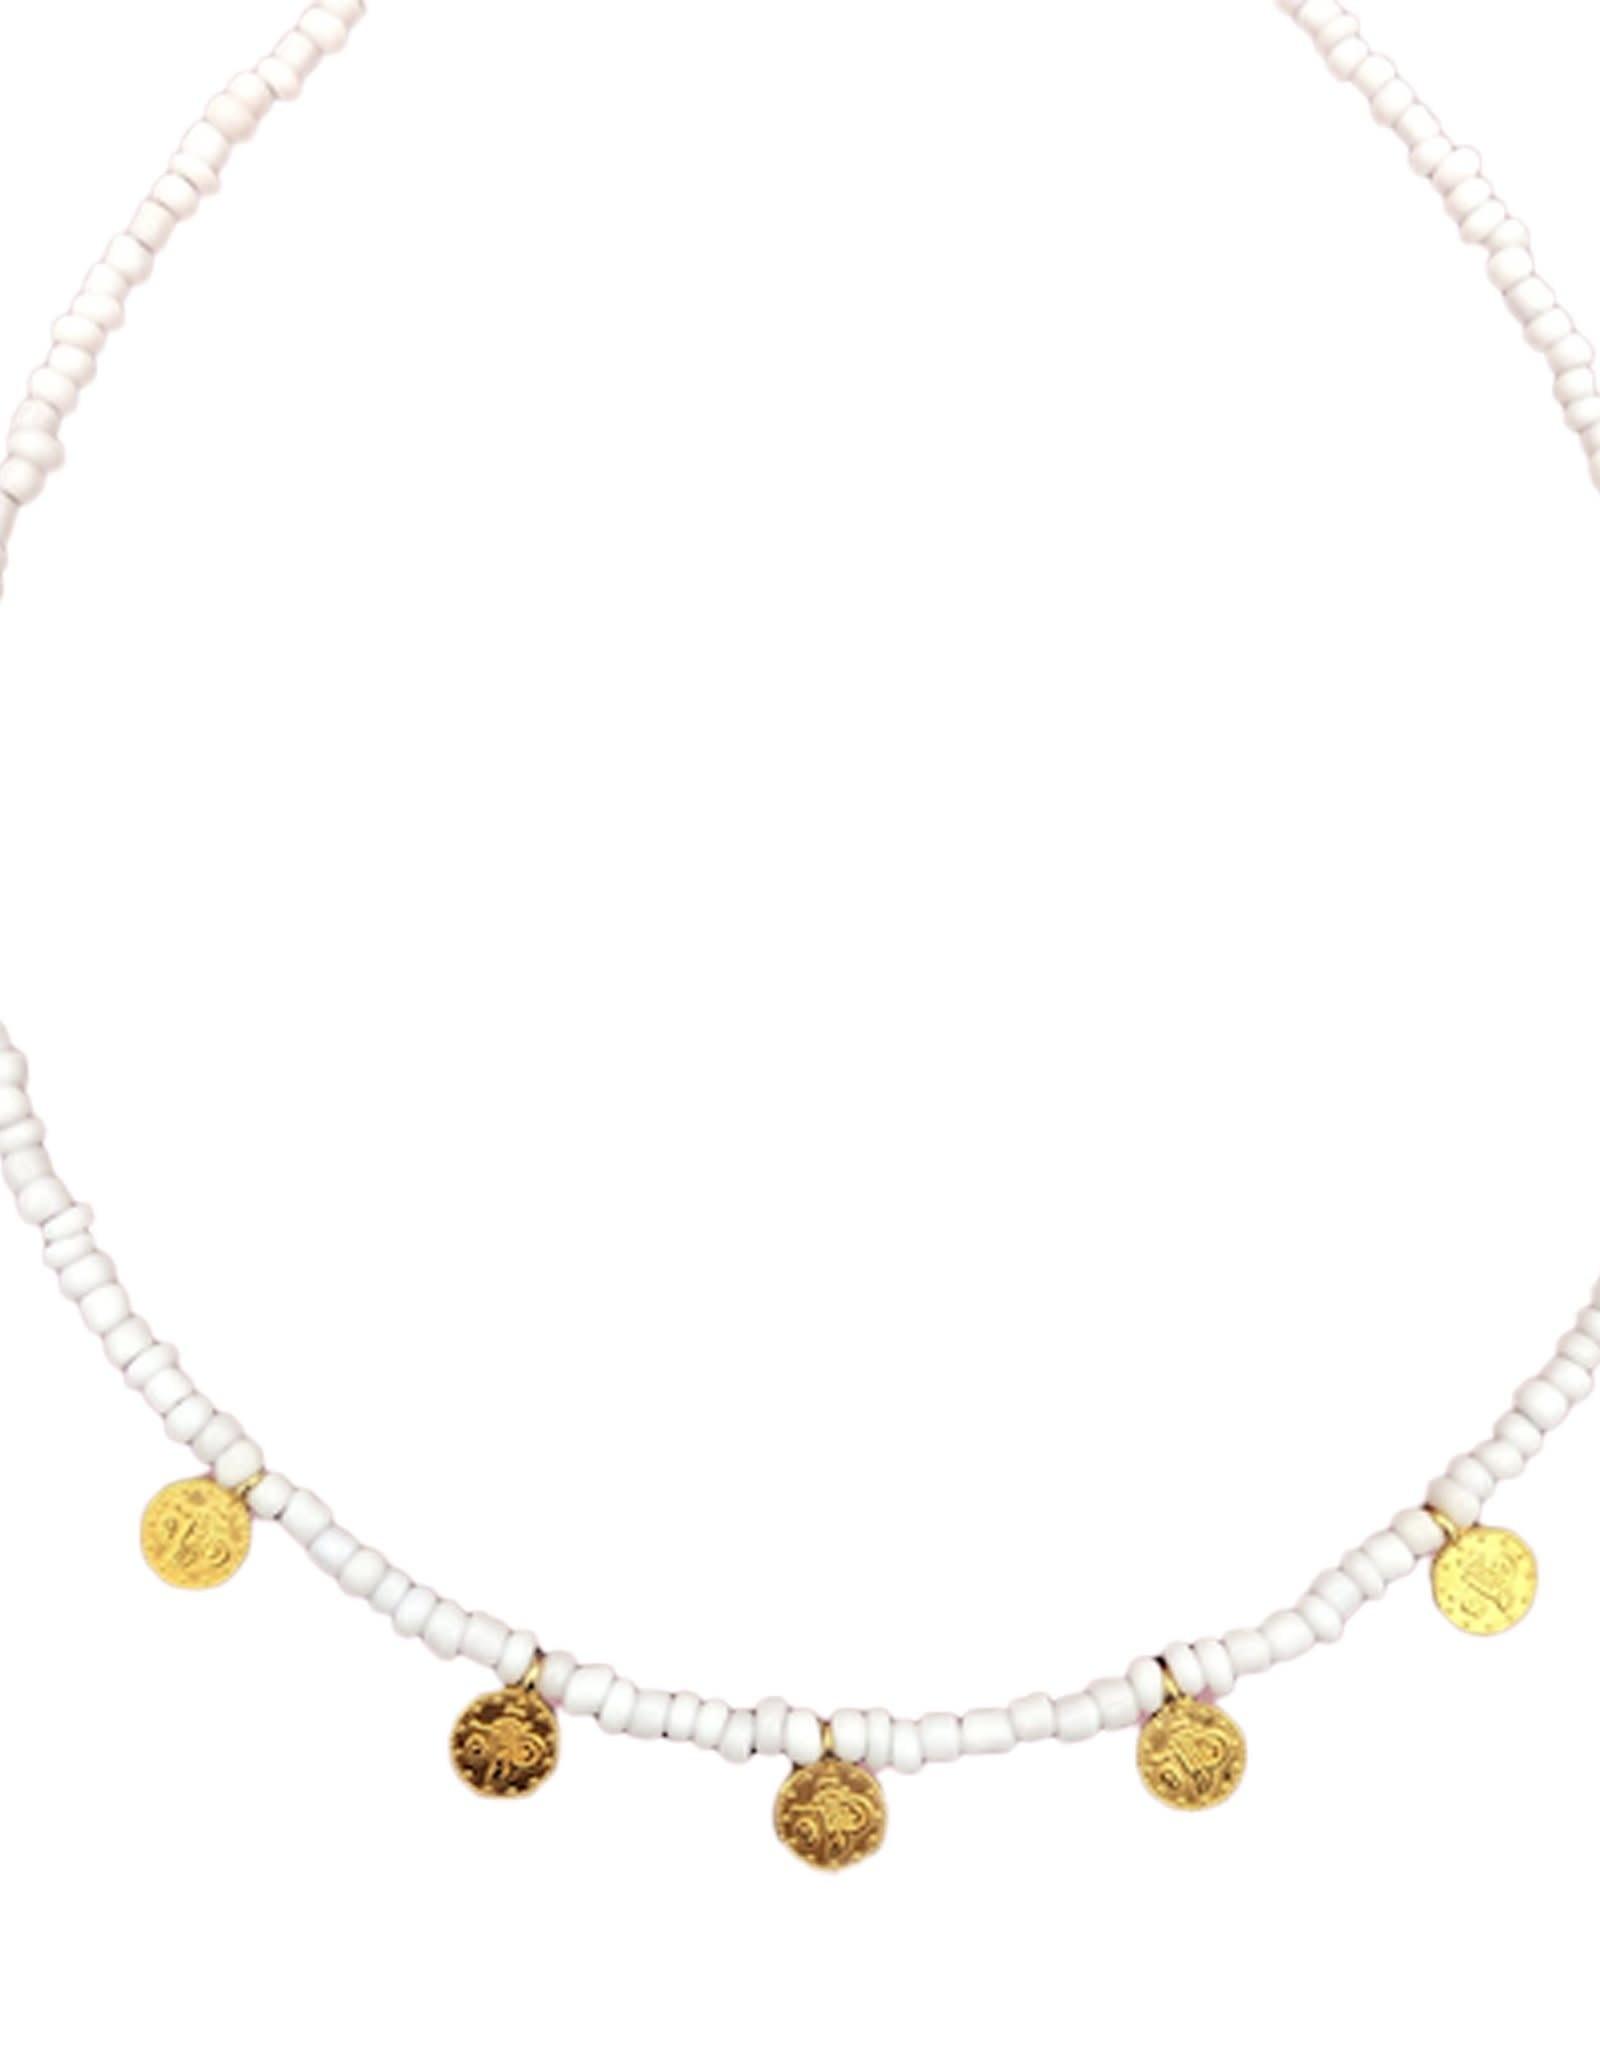 Boho-Beach 5 gold coins necklace white